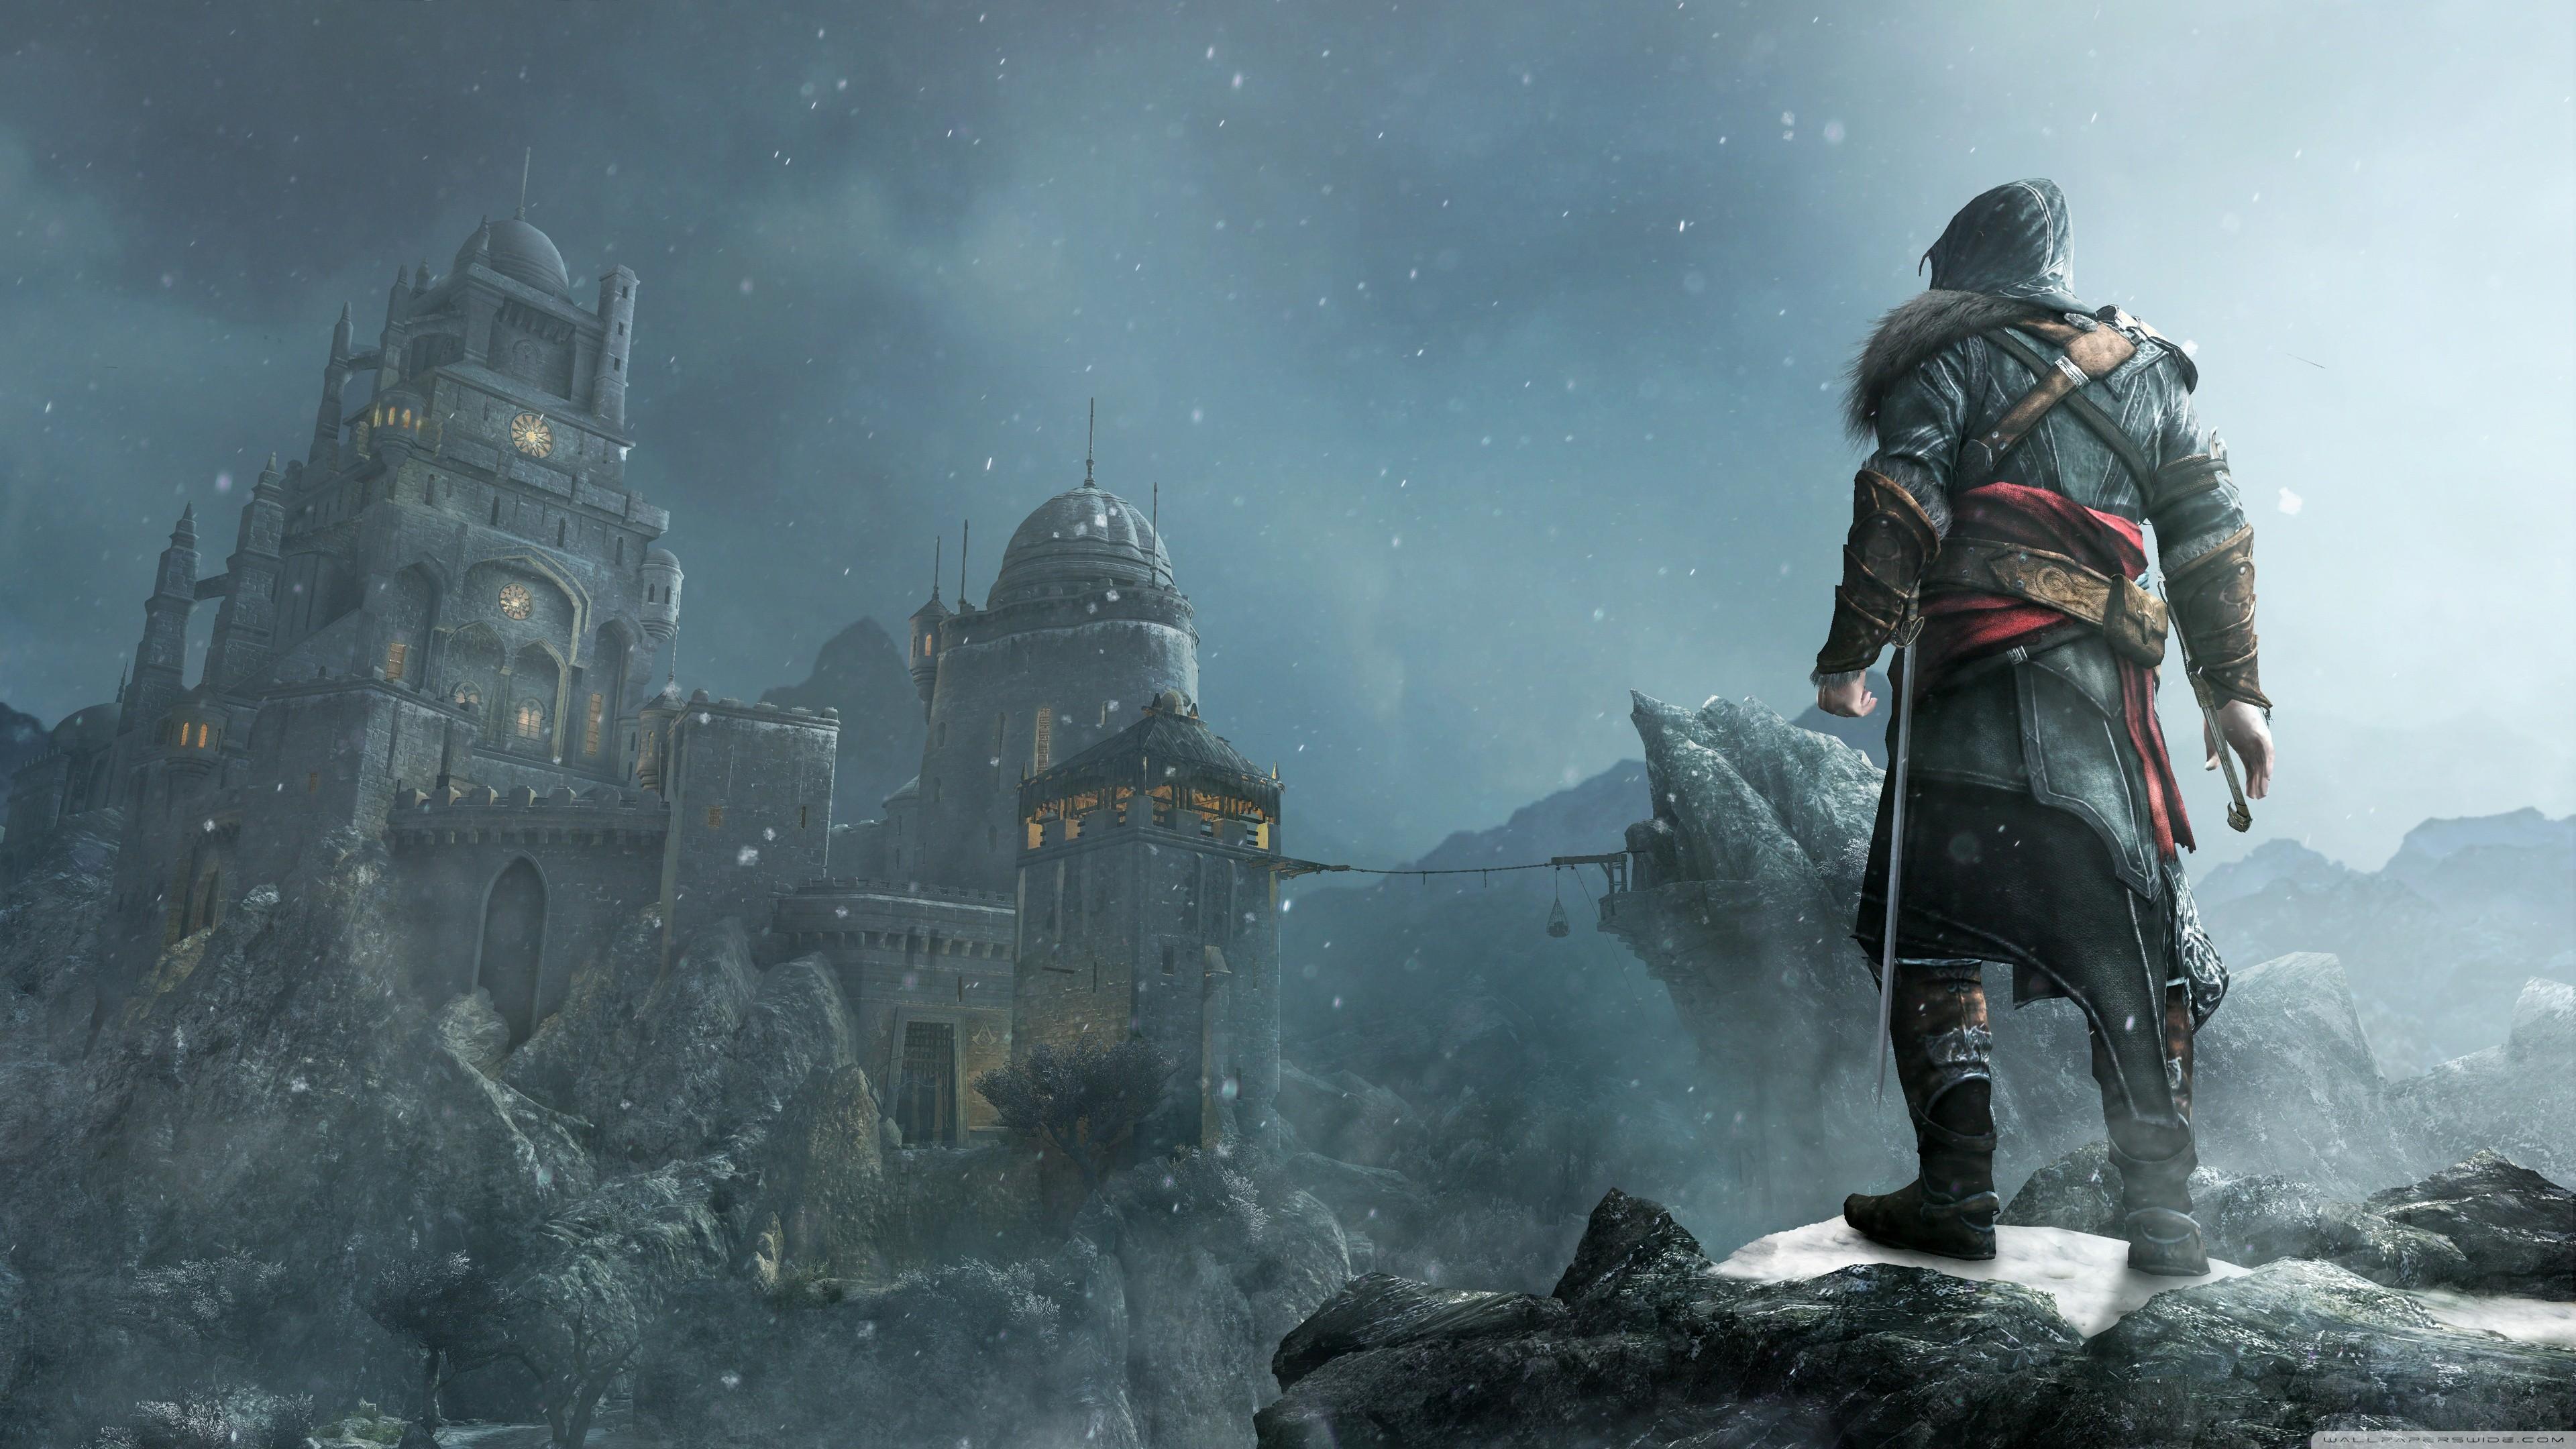 Buy Assassins Creed Revelations 3840x2160